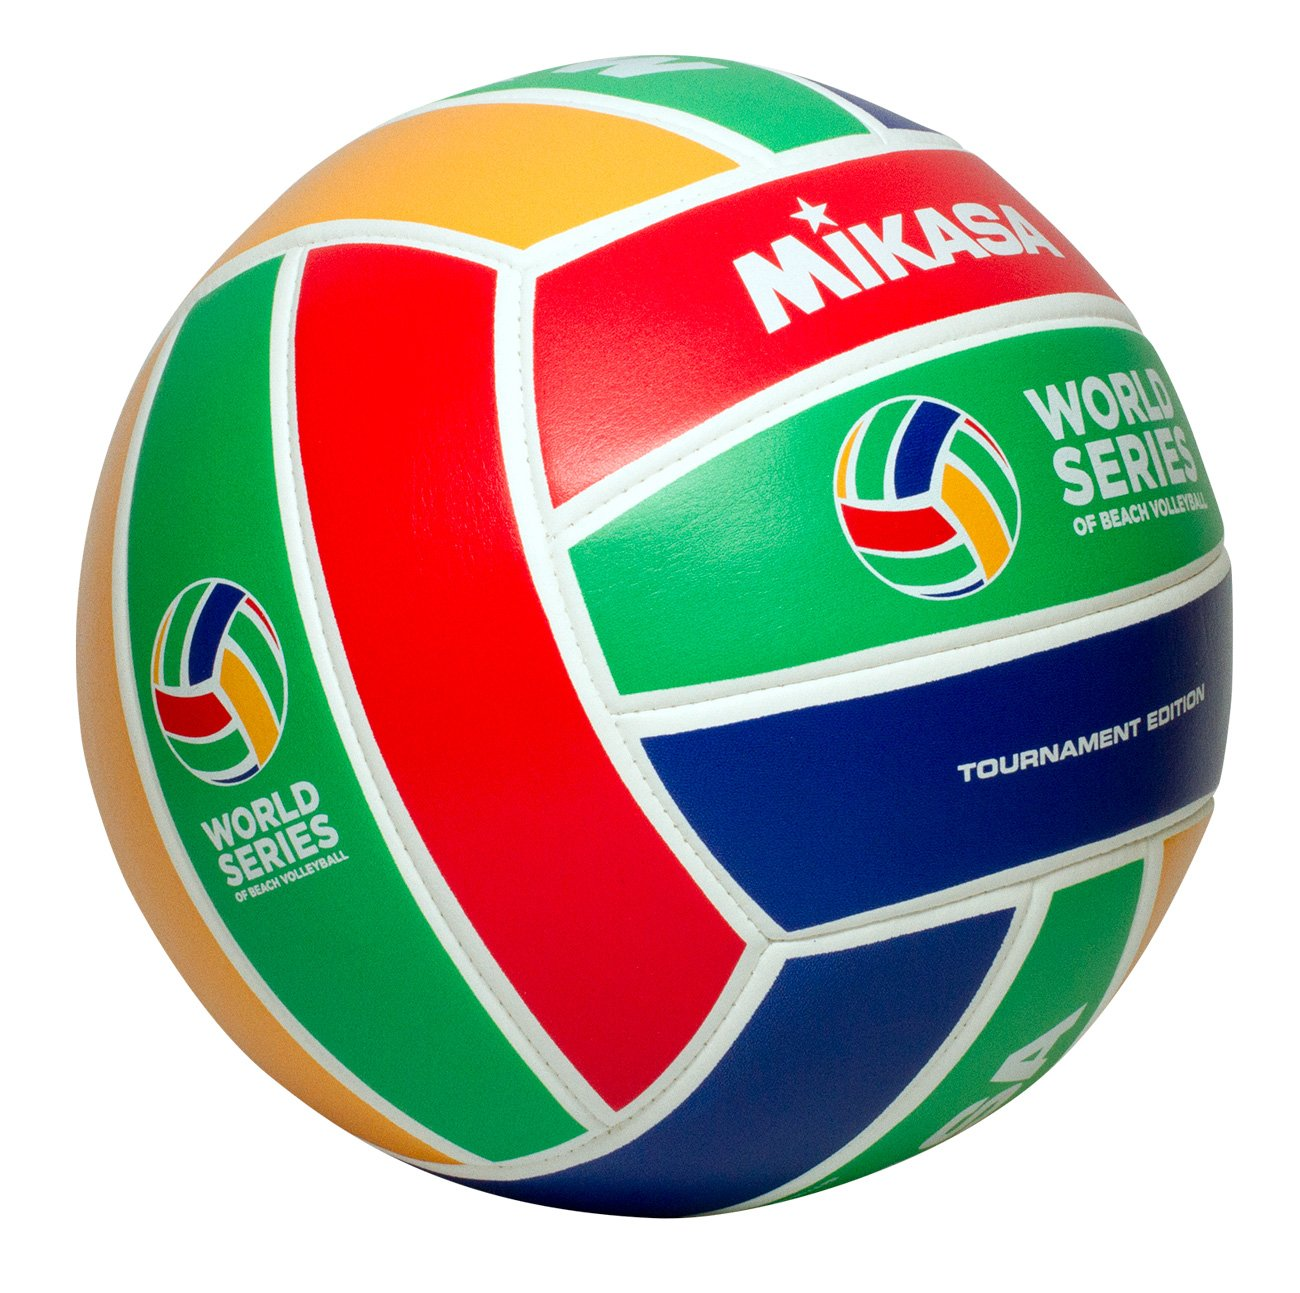 Mikasa voleibol de playa de la serie mundial - WS-Y Mikasa Sports USA